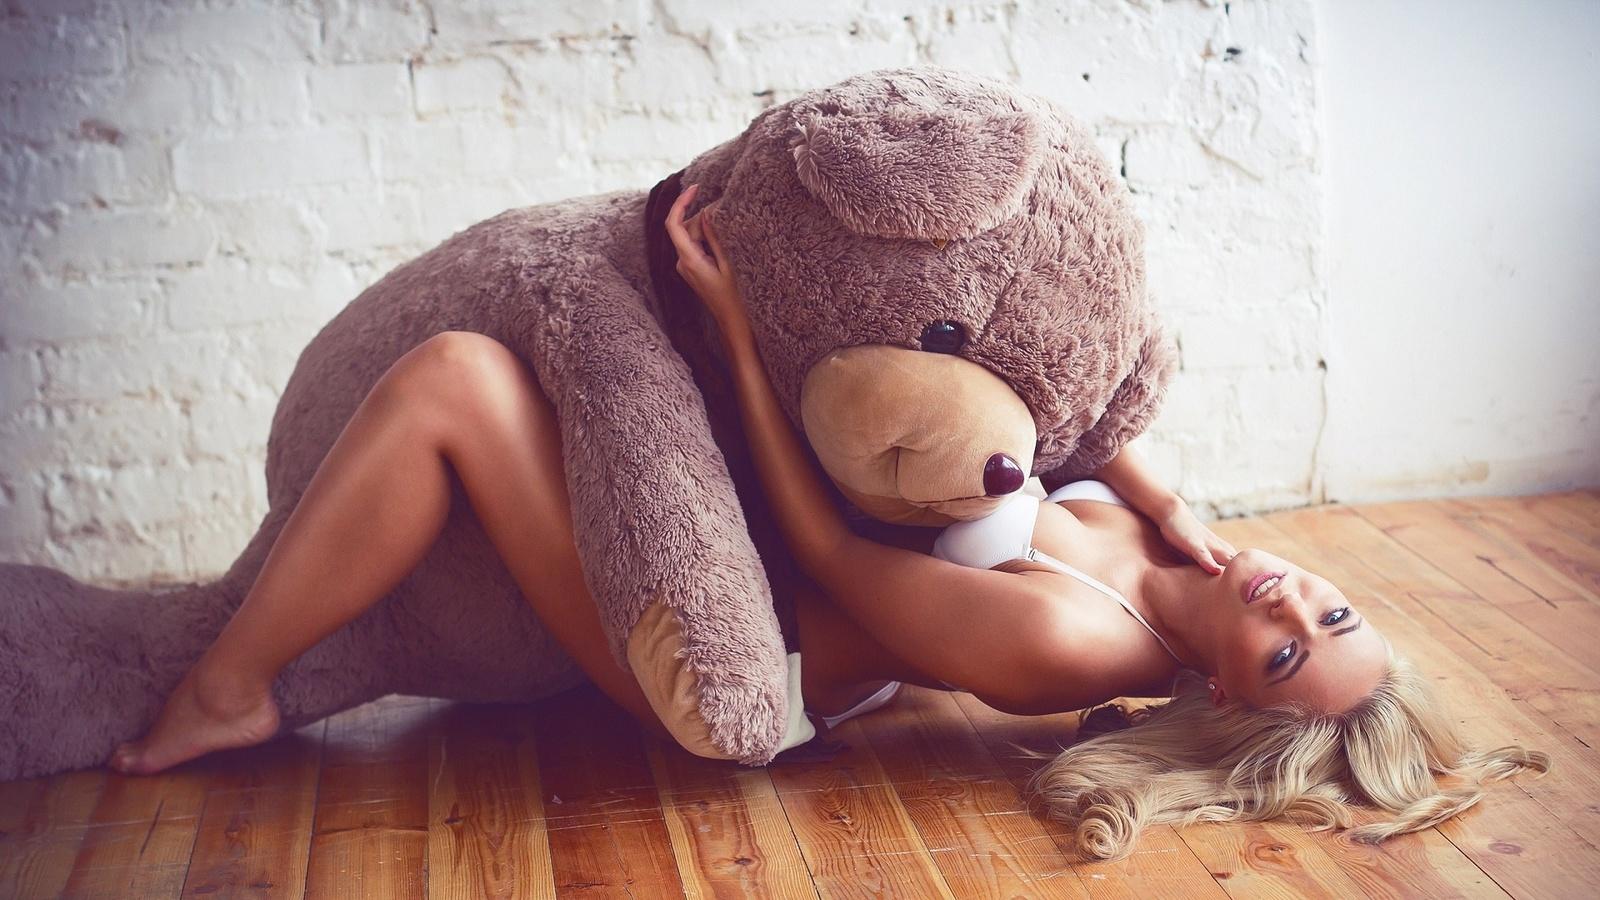 blonde, model, perfect, women, cute, ass, pretty, beautiful, bed, sexy, hot, window, wall, teddy, lying down, wooden floor, плюшевый мишка